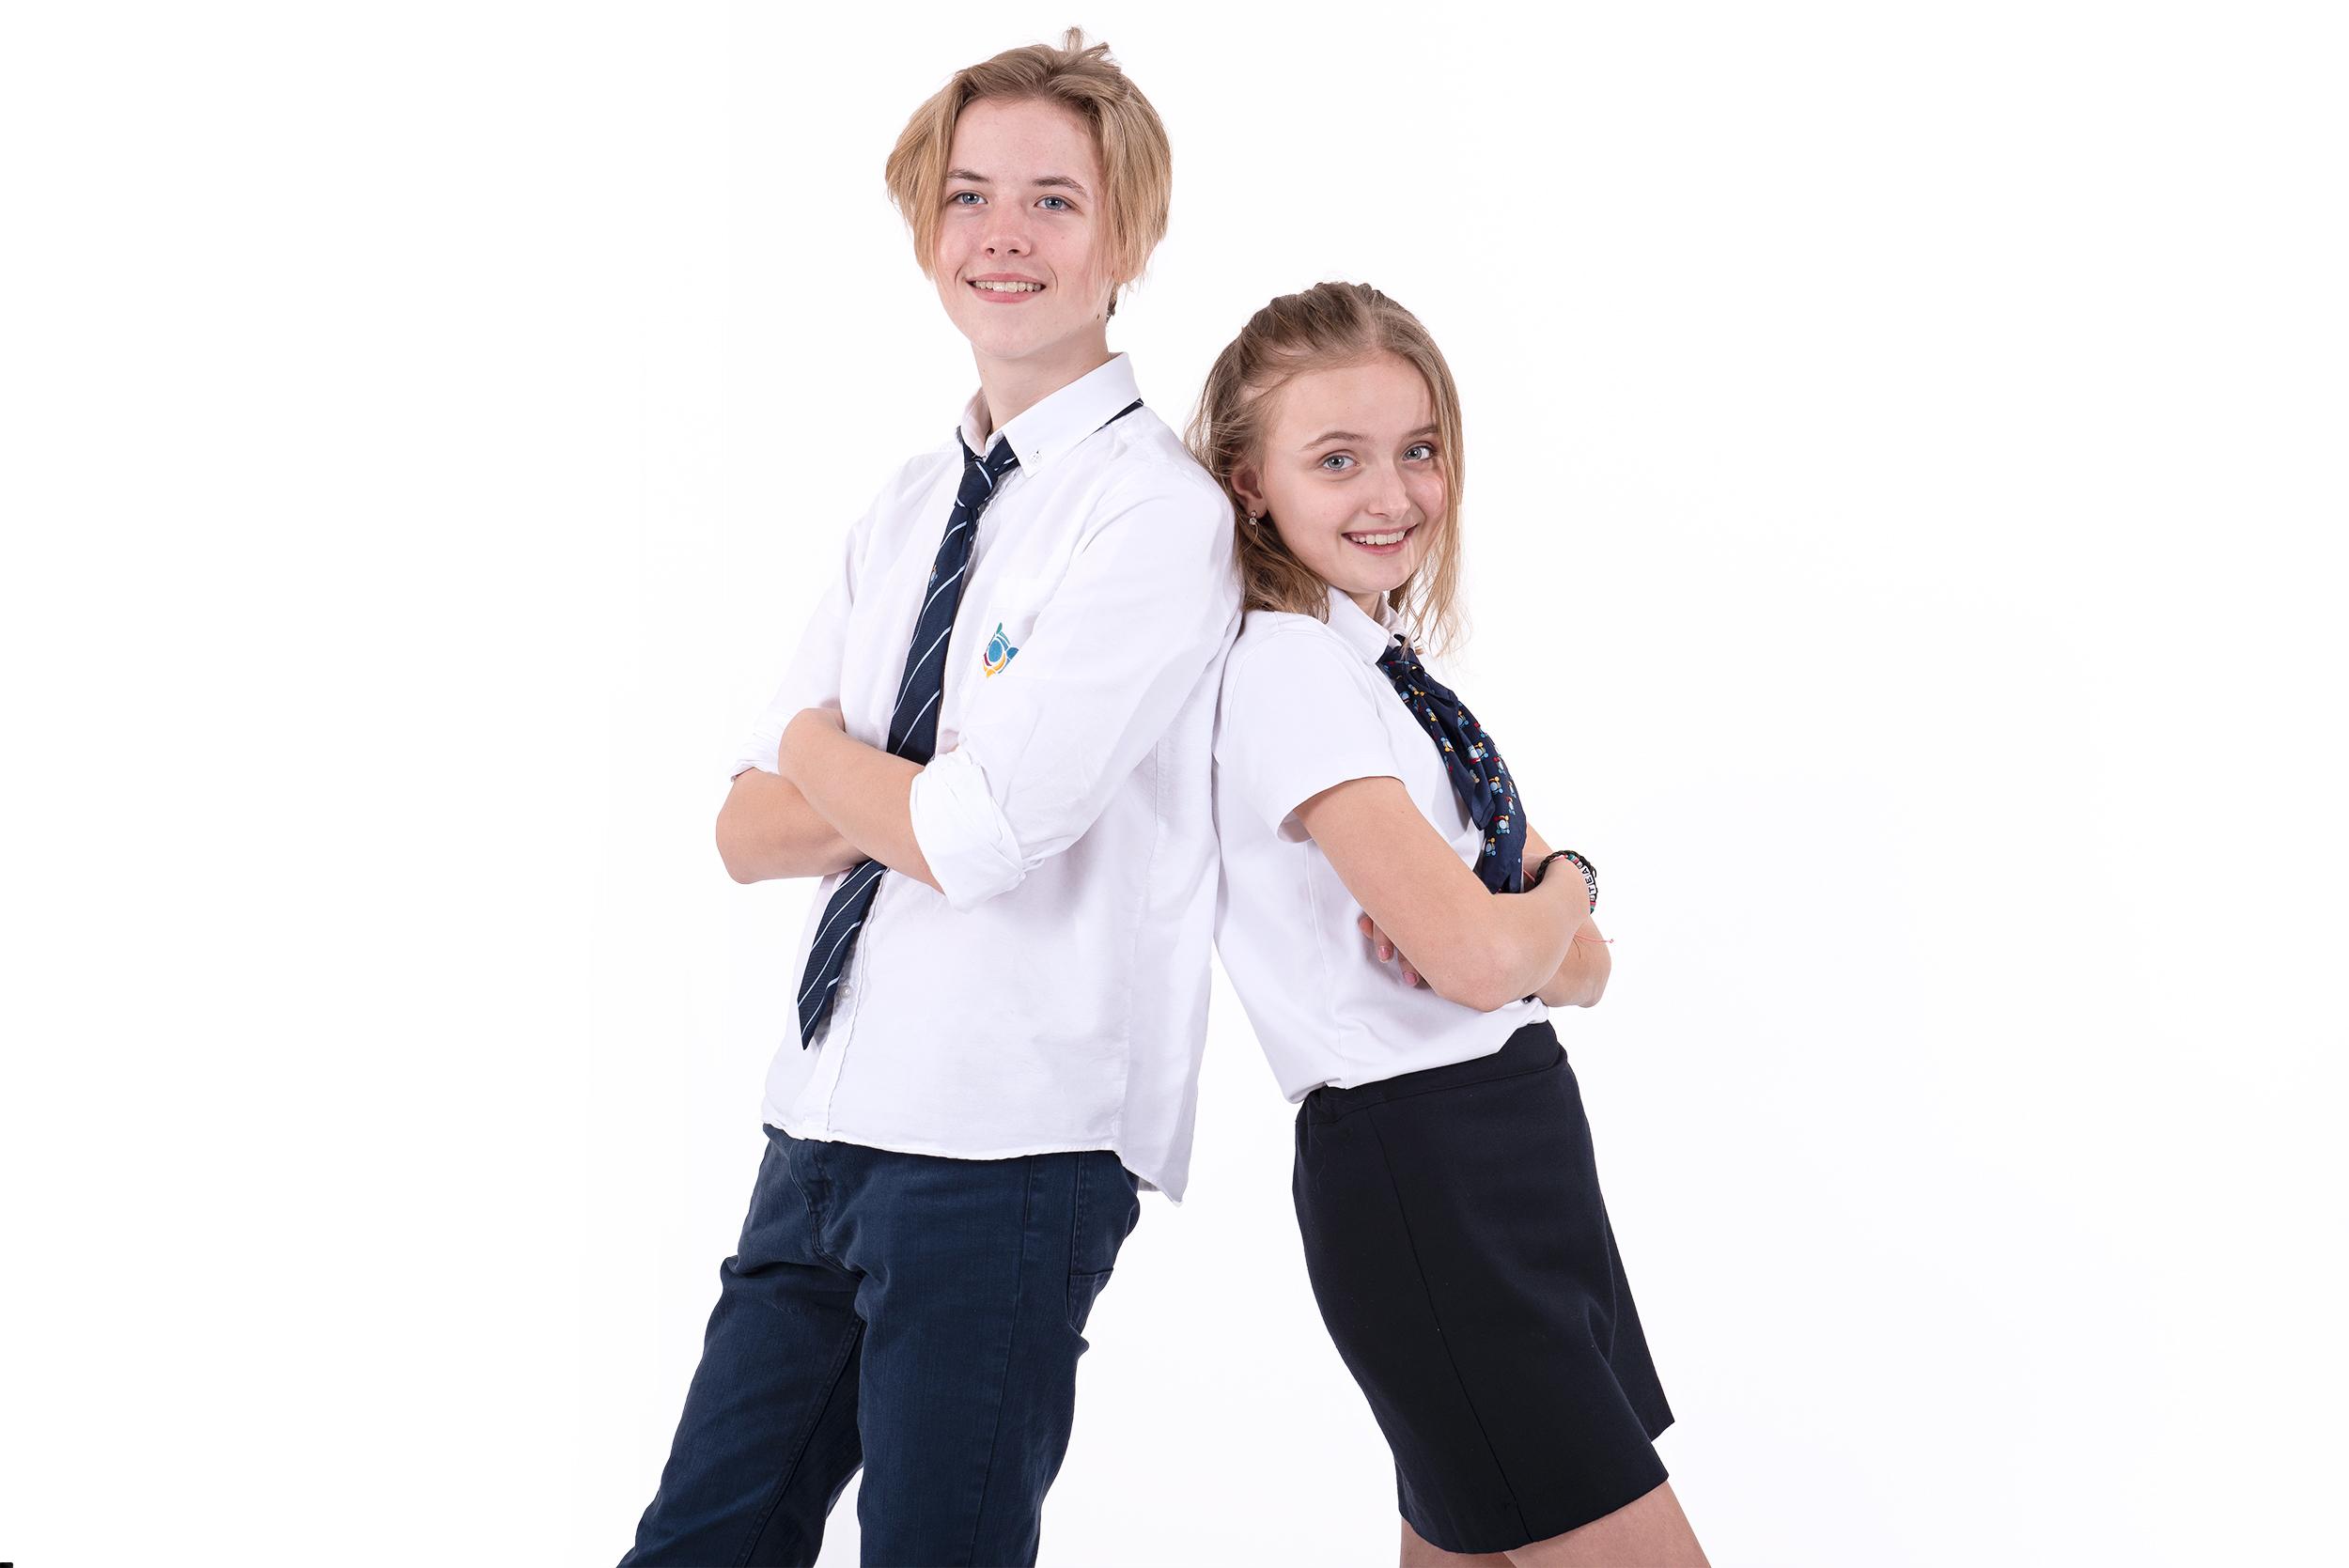 Teenagers photography sgs studios